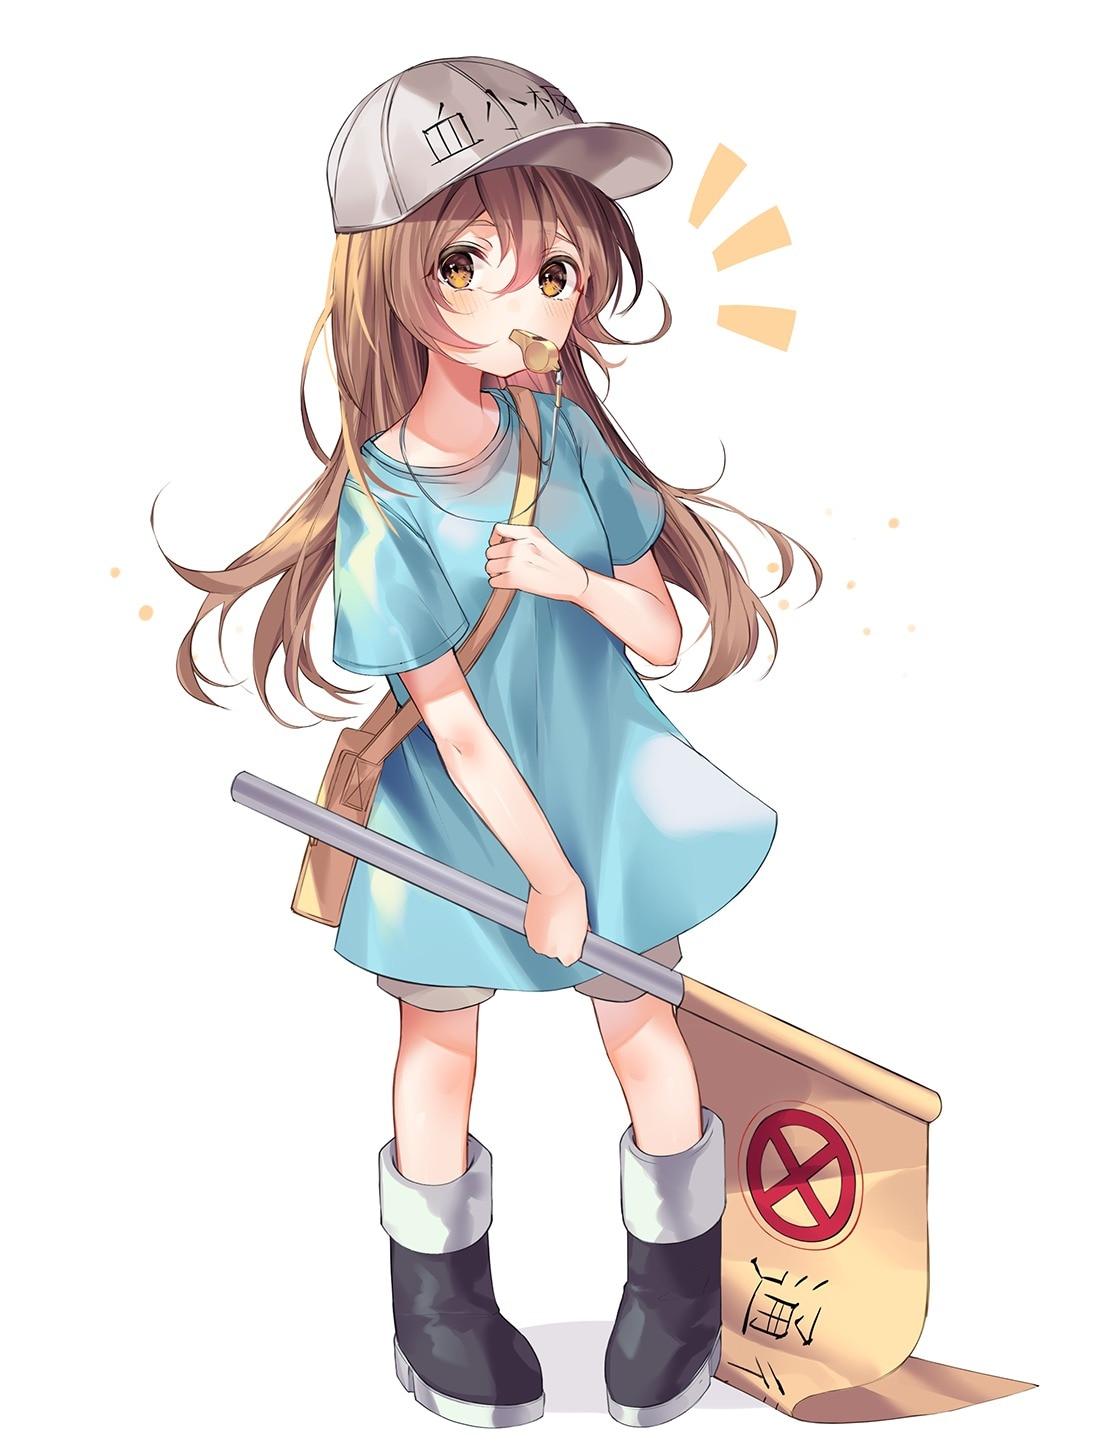 【P站画师】韩国画师Kinty的插画作品- ACG17.COM